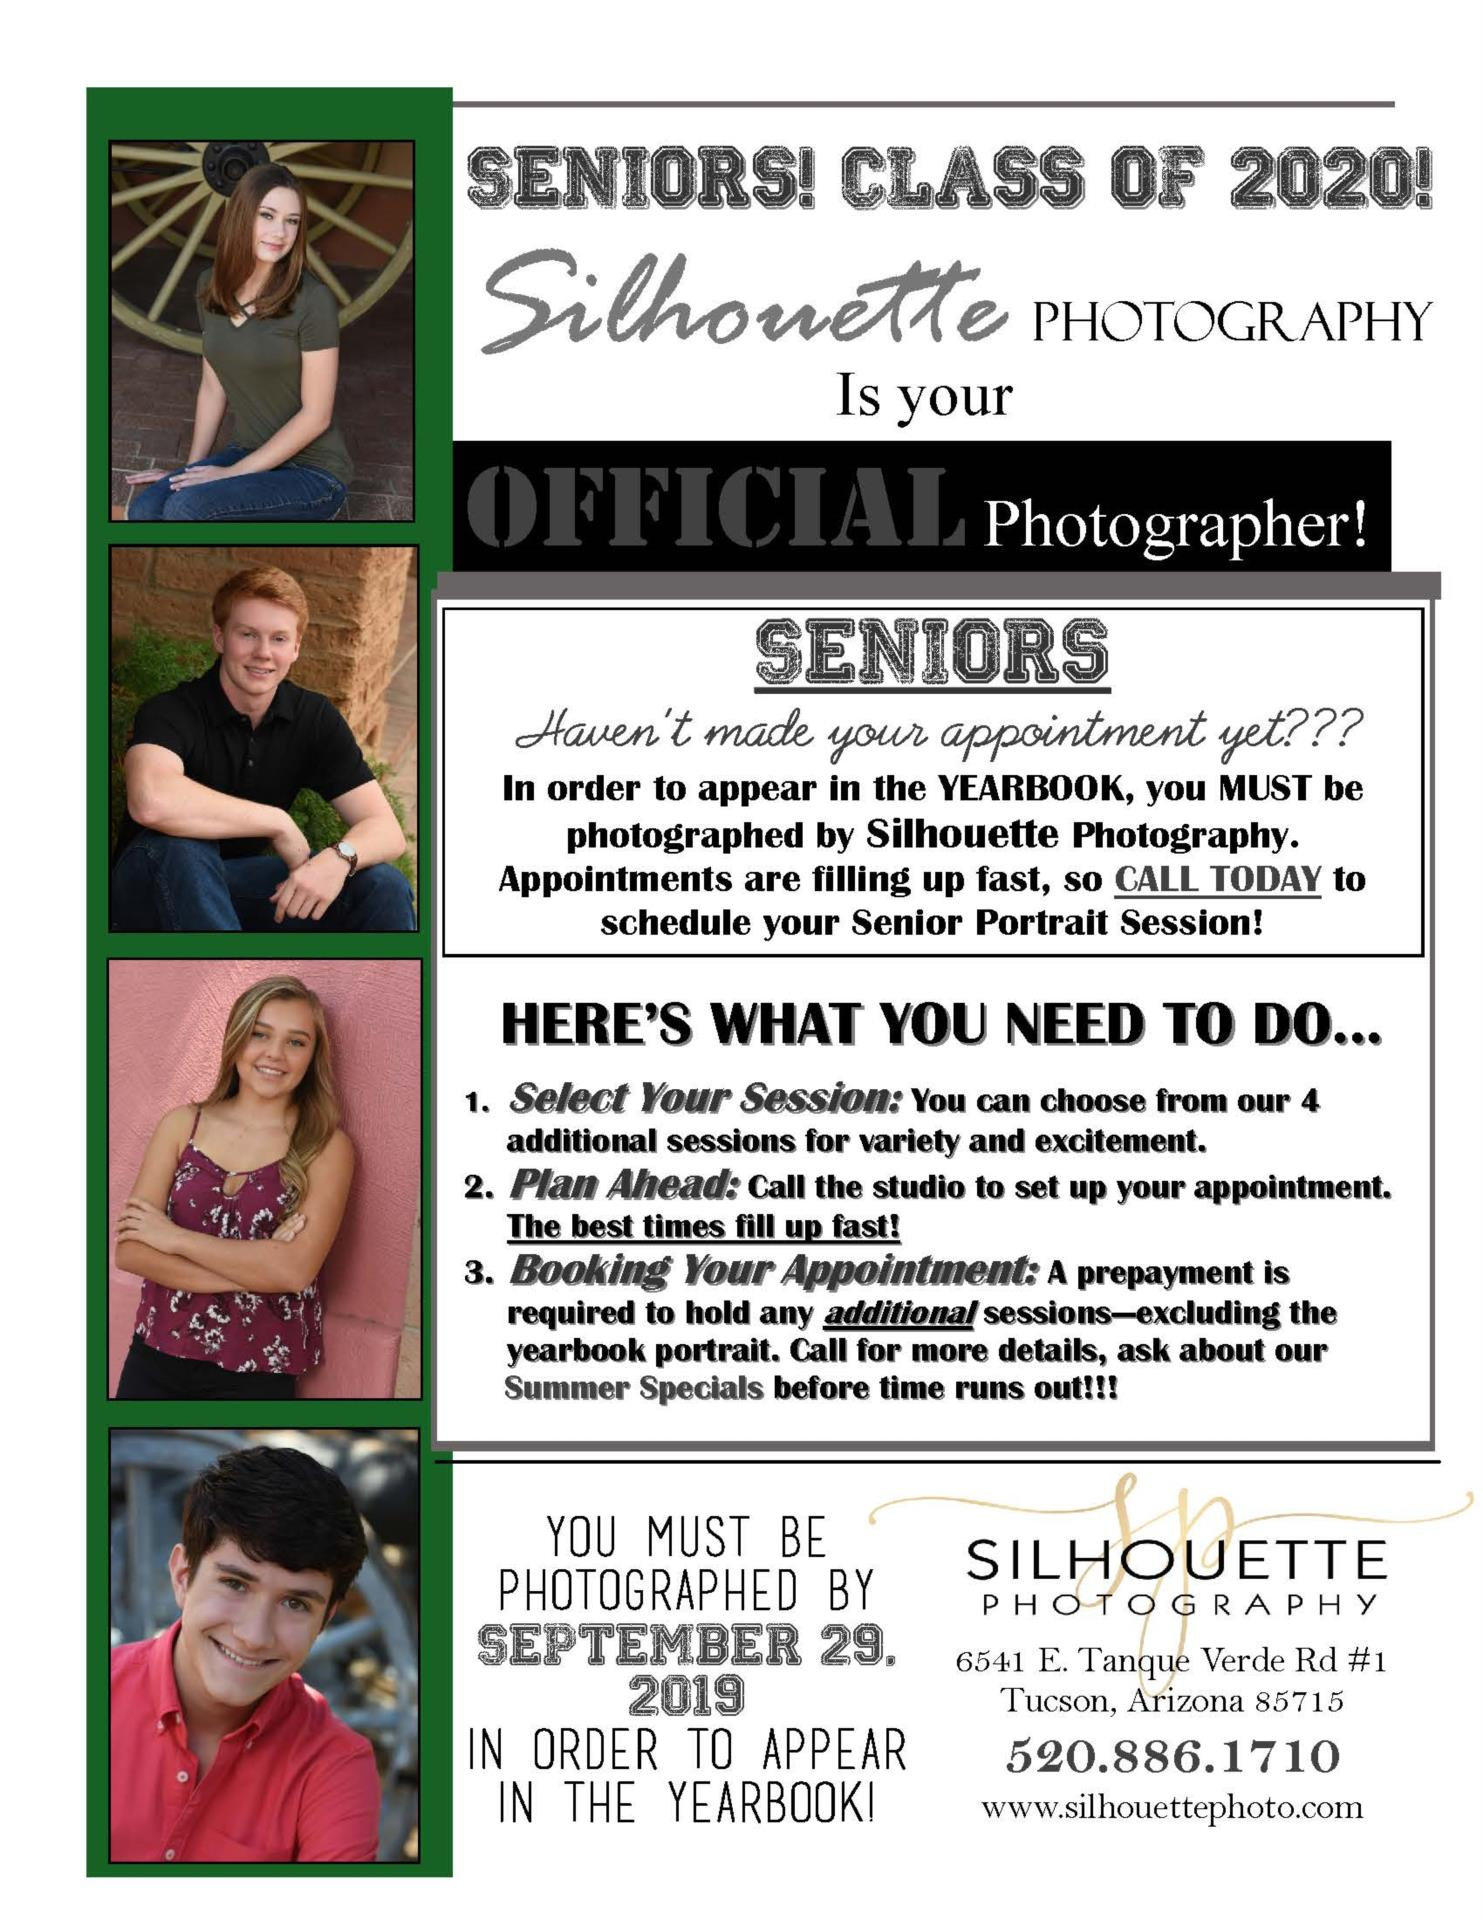 Senior Silhouette advertisement photo